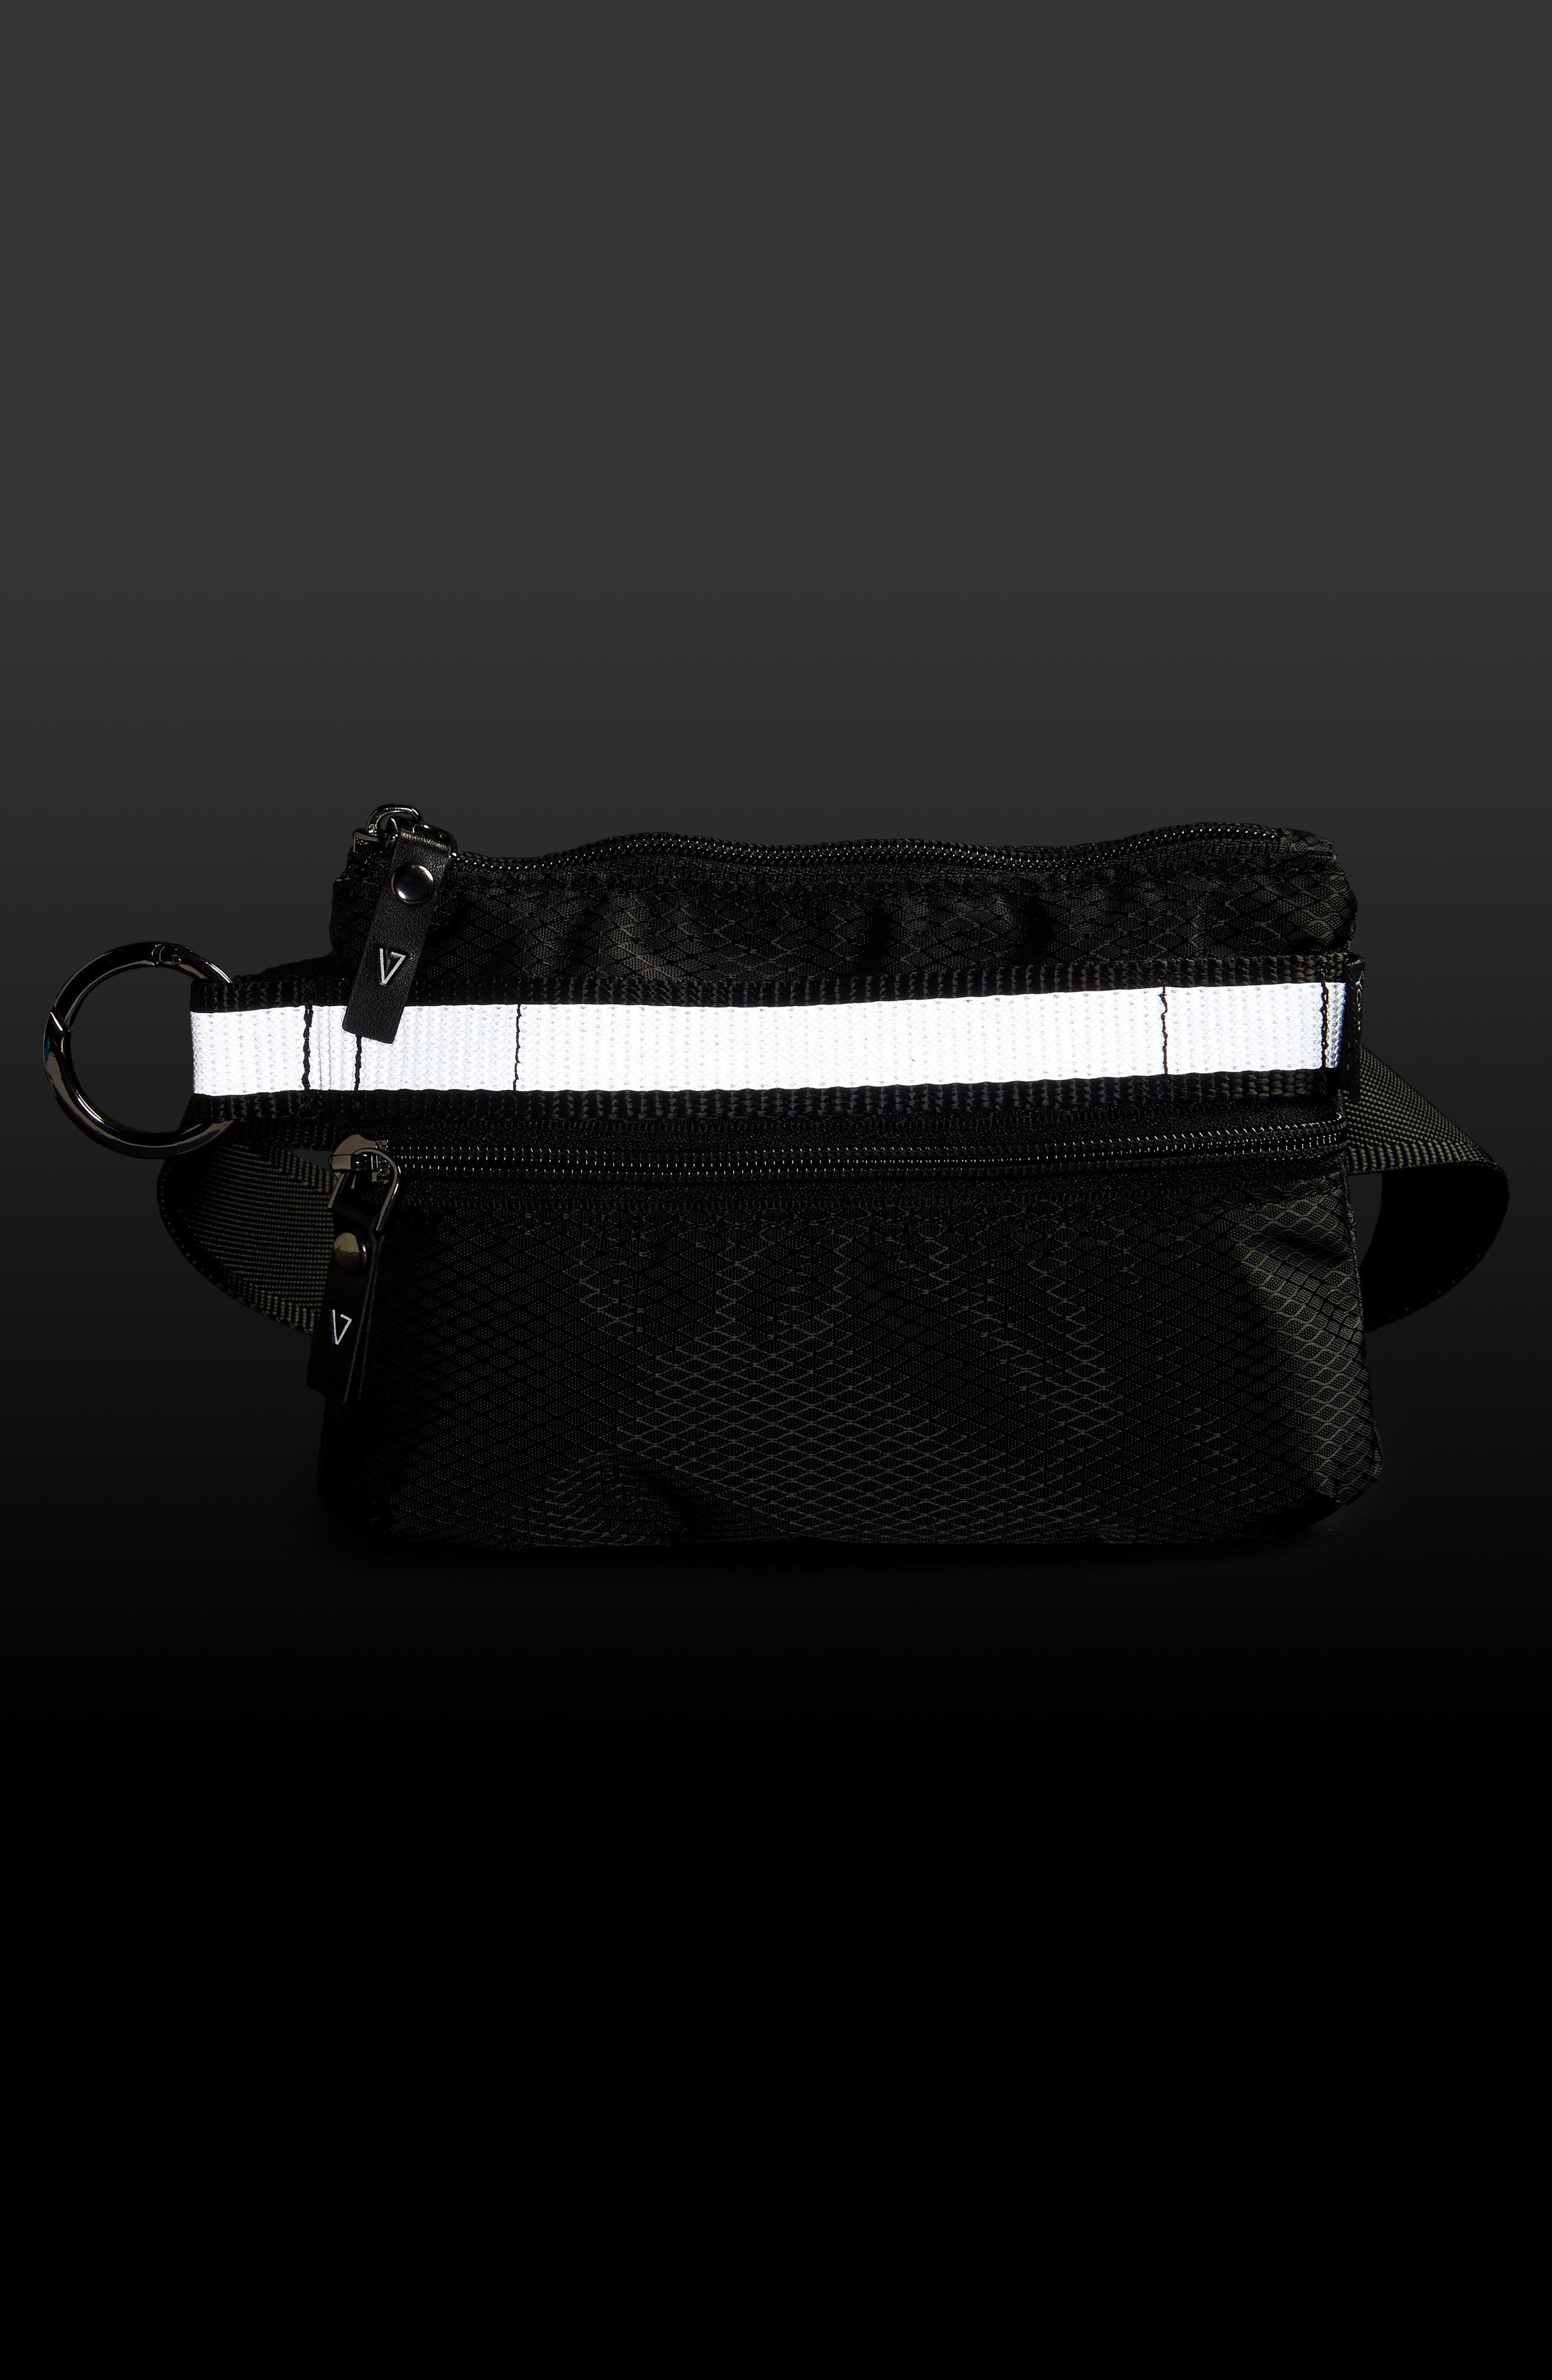 Urban Clutch Convertible Belt Bag,                             Alternate thumbnail 9, color,                             BLACK/ REFLECTIVE STRIPE